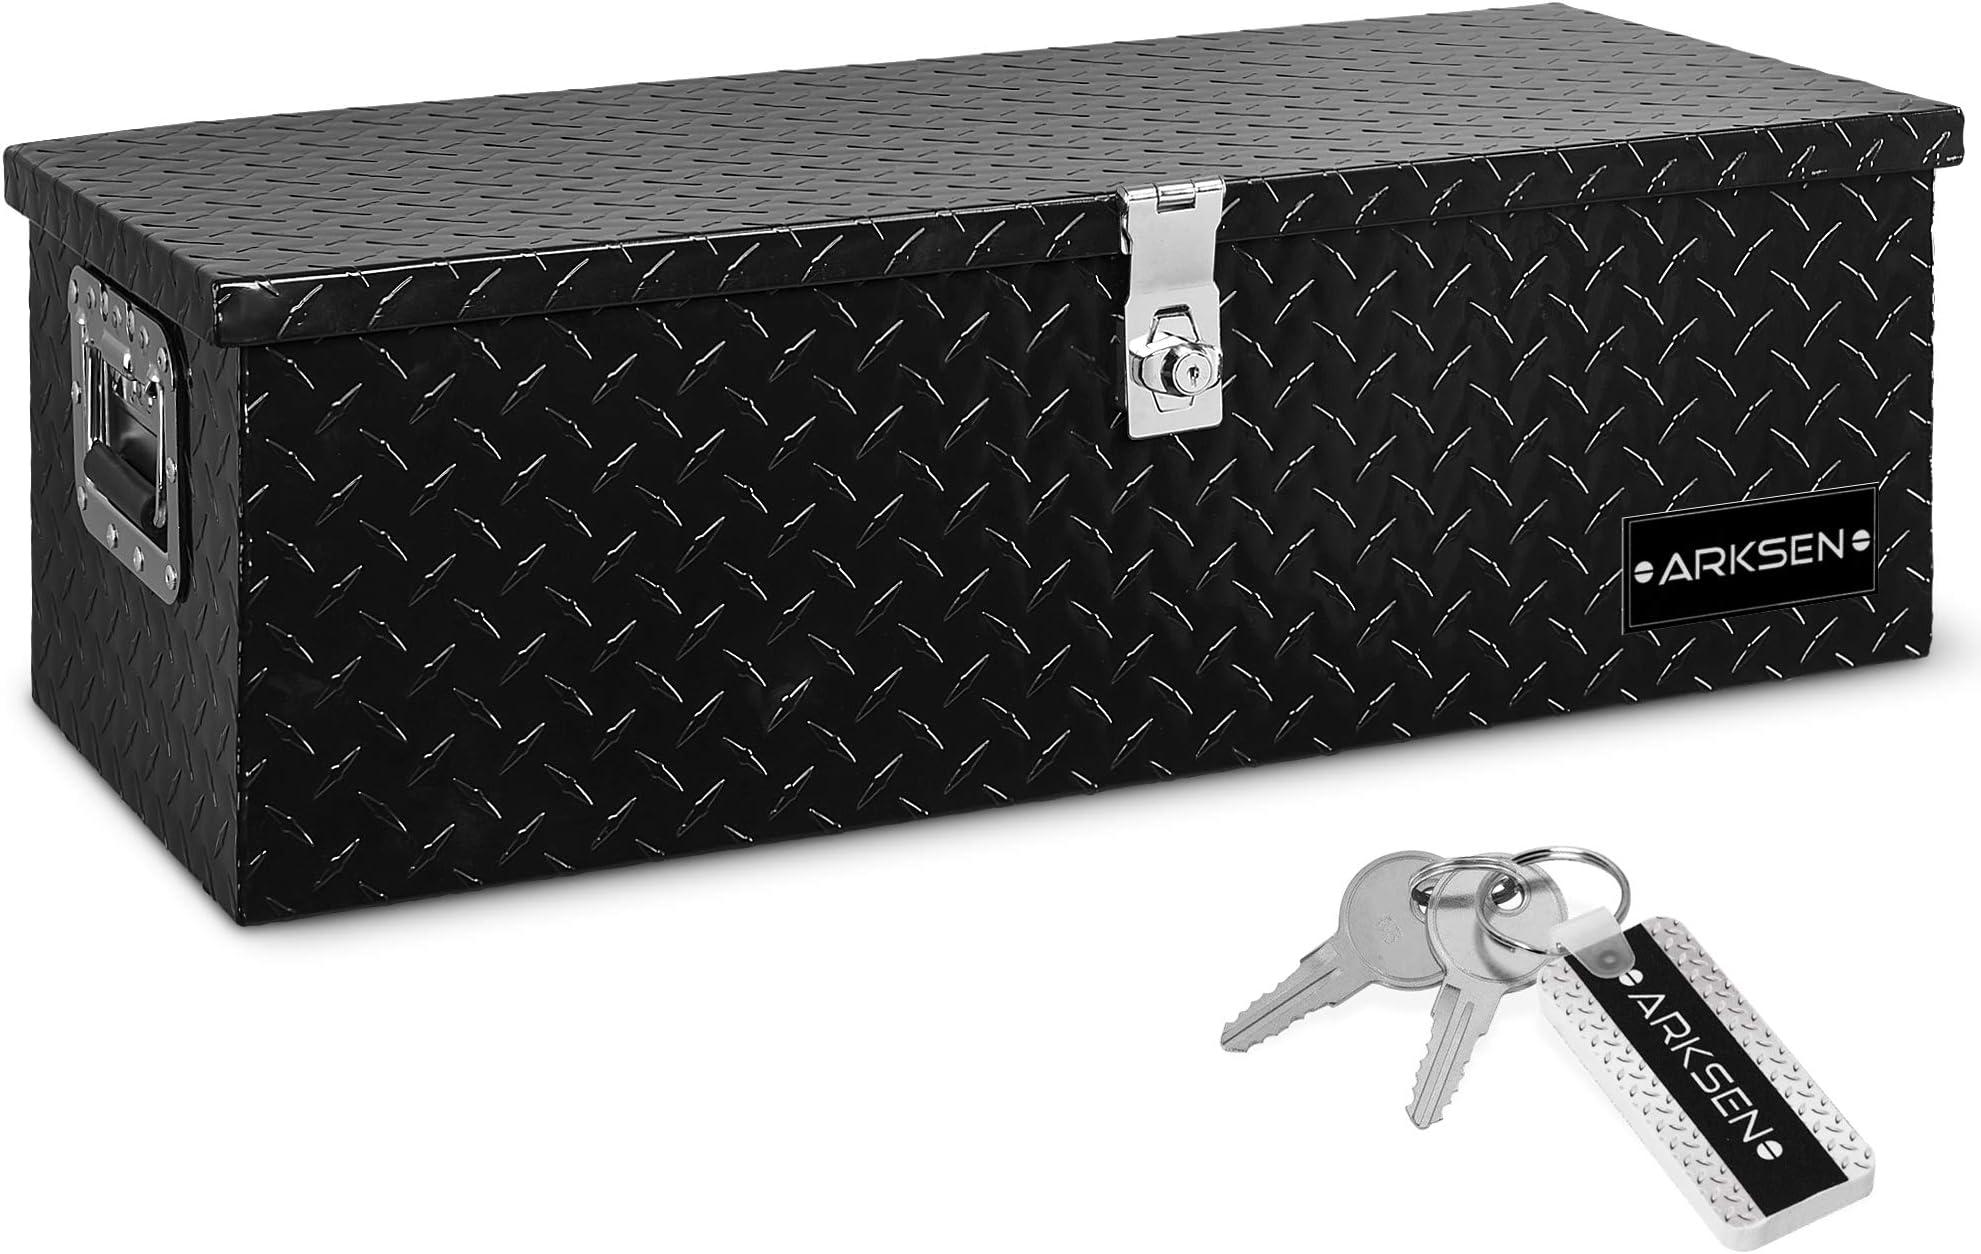 ARKSEN 30 Inch Aluminum Truck Pick Up Tool Box TruckBed Trailer RV Storage Organizer Lock with keys, Black